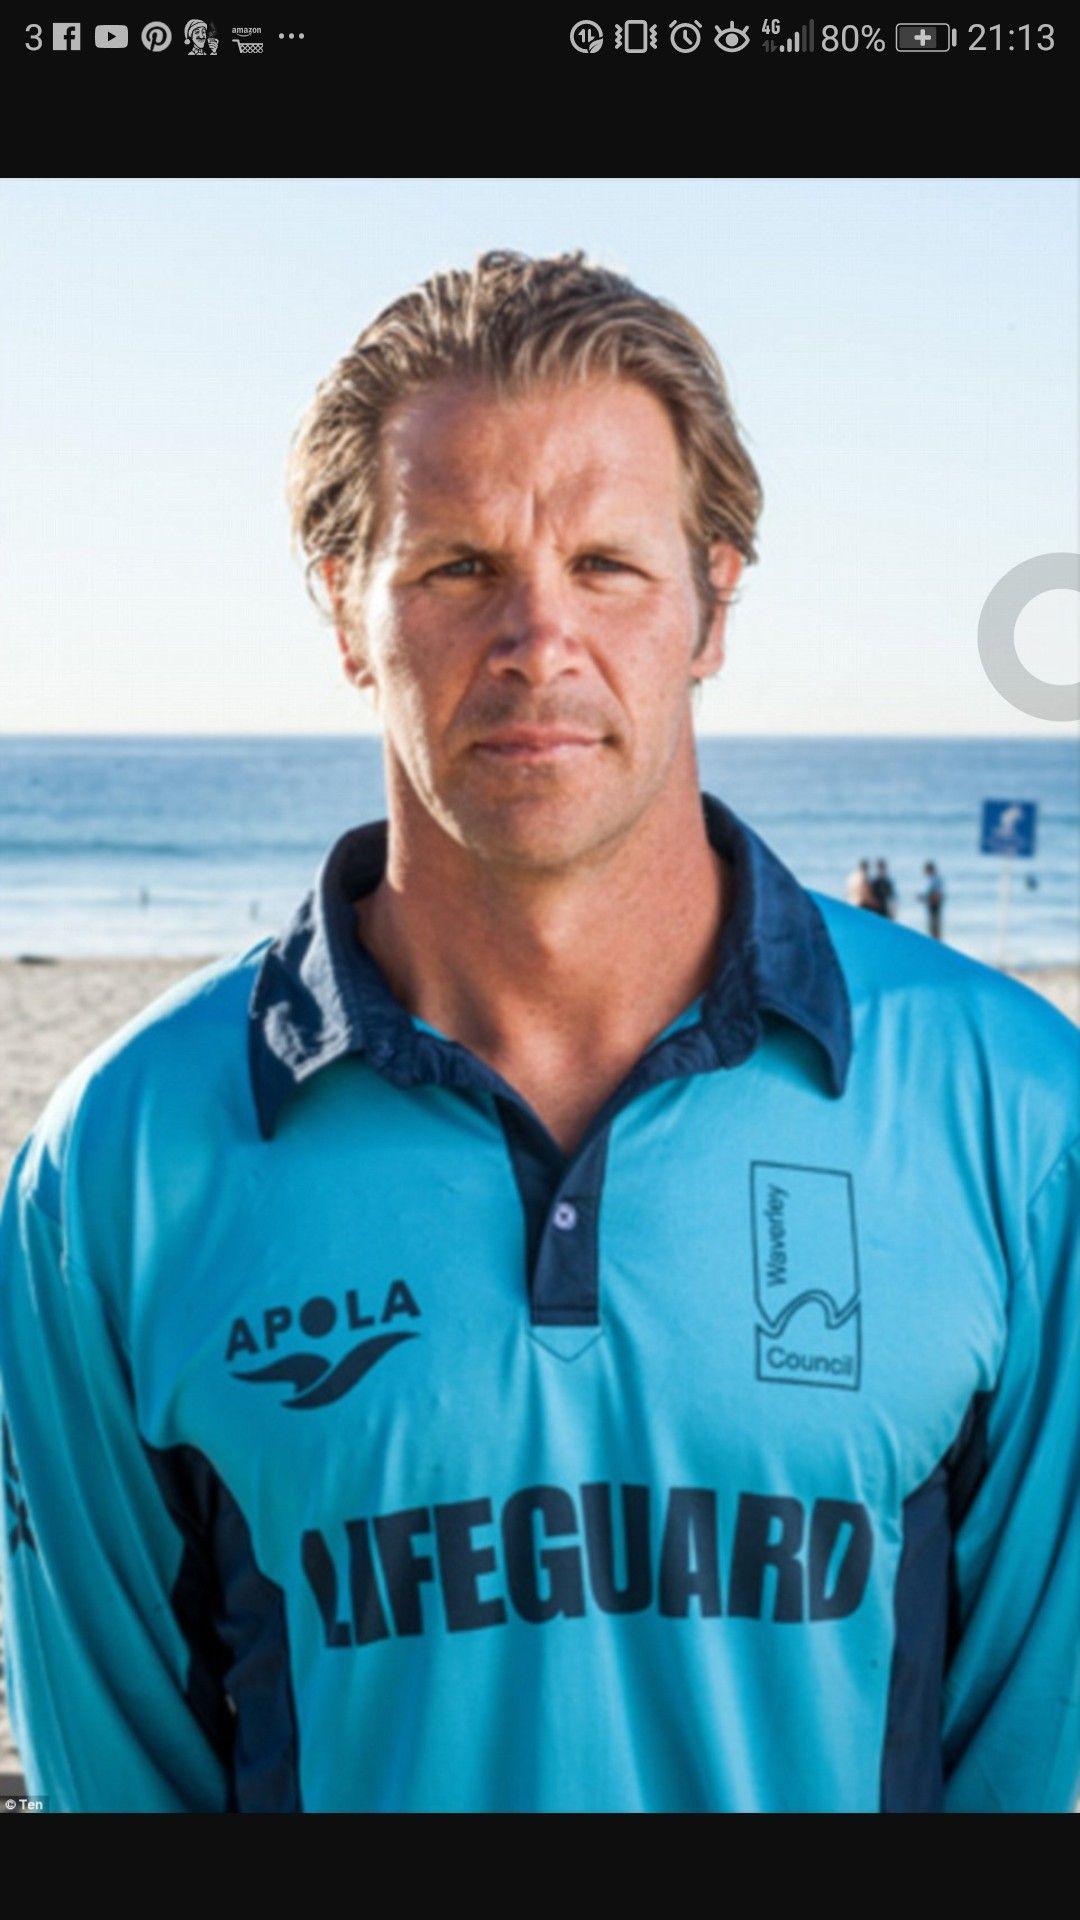 Trent Falson Singlets Bondi Rescue Lifeguard Beach Lifeguard Lifeguard Singlets